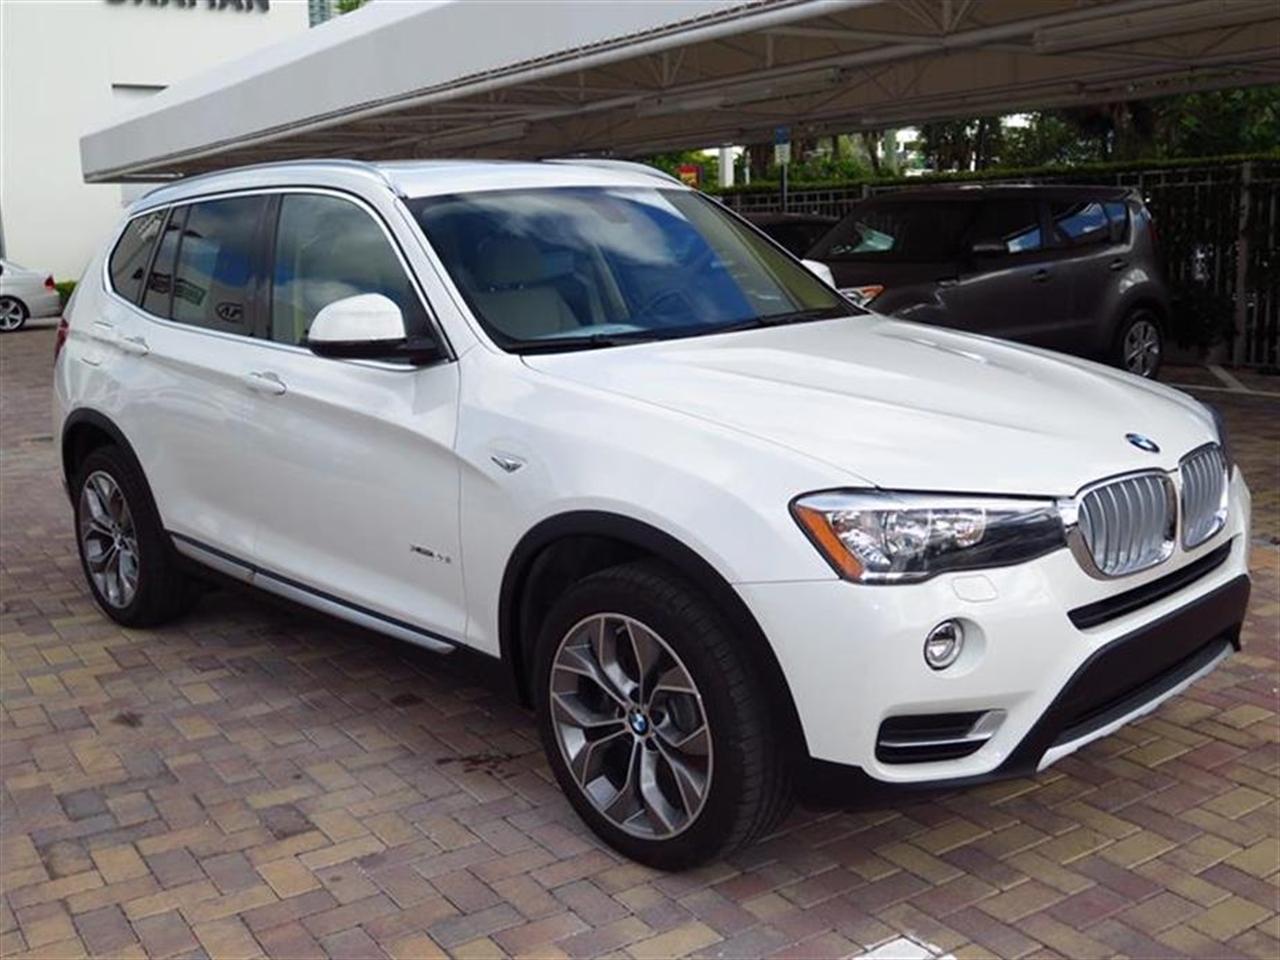 2015 BMW X3 AWD 4dr xDrive28i 2309 miles 2 Seatback Storage Pockets 3 12V DC Power Outlets 40-2